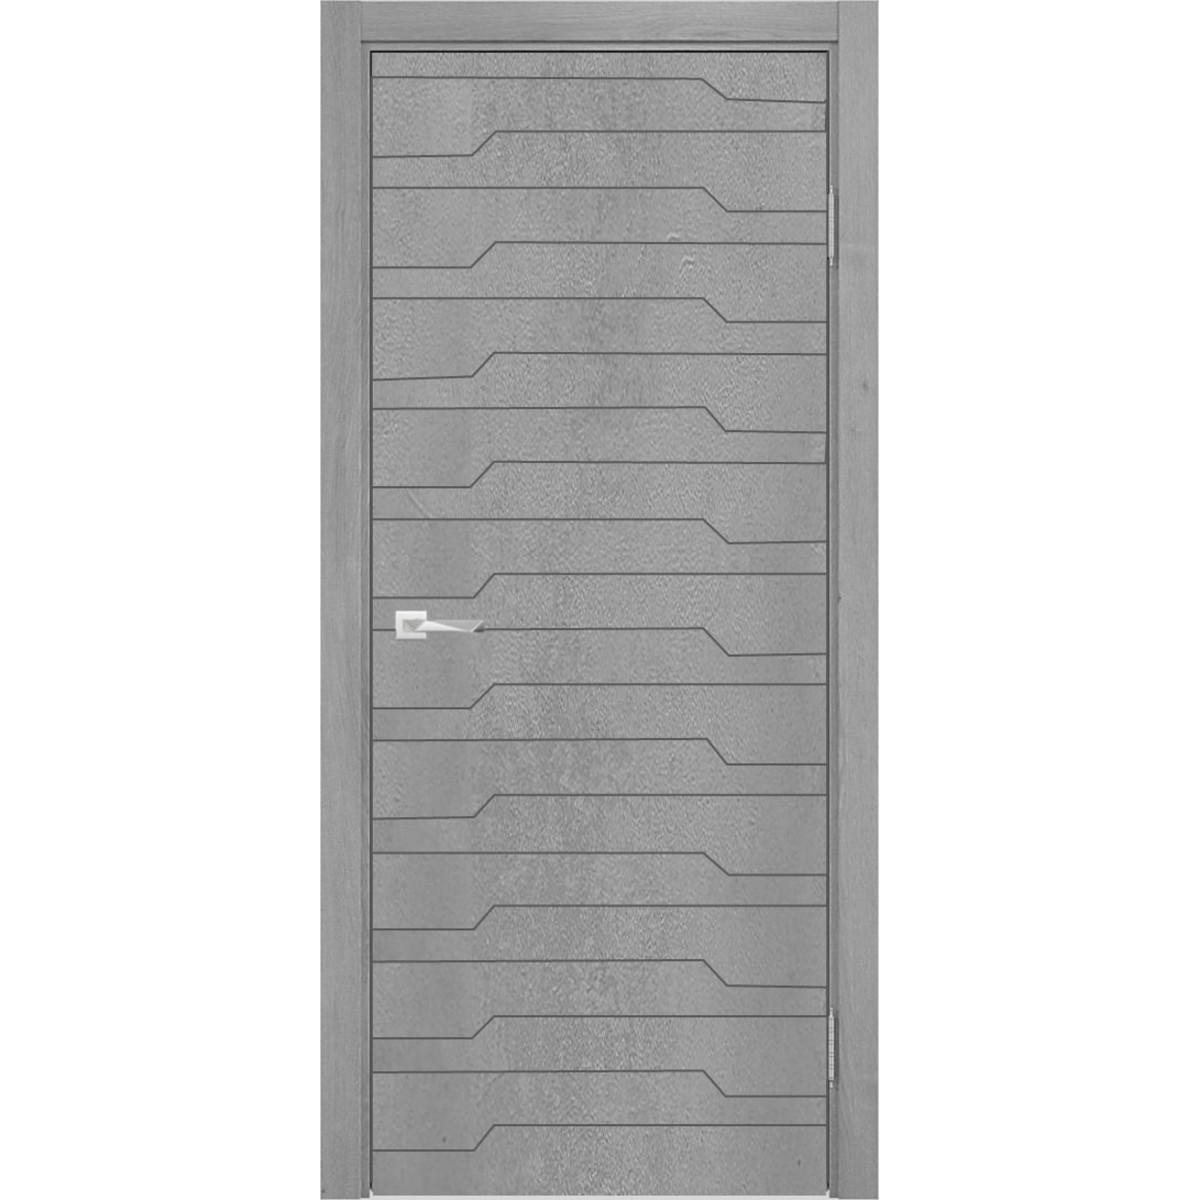 Дверное полотно Loyard Севилья МП_0384 2000х600х44 мм МДФ